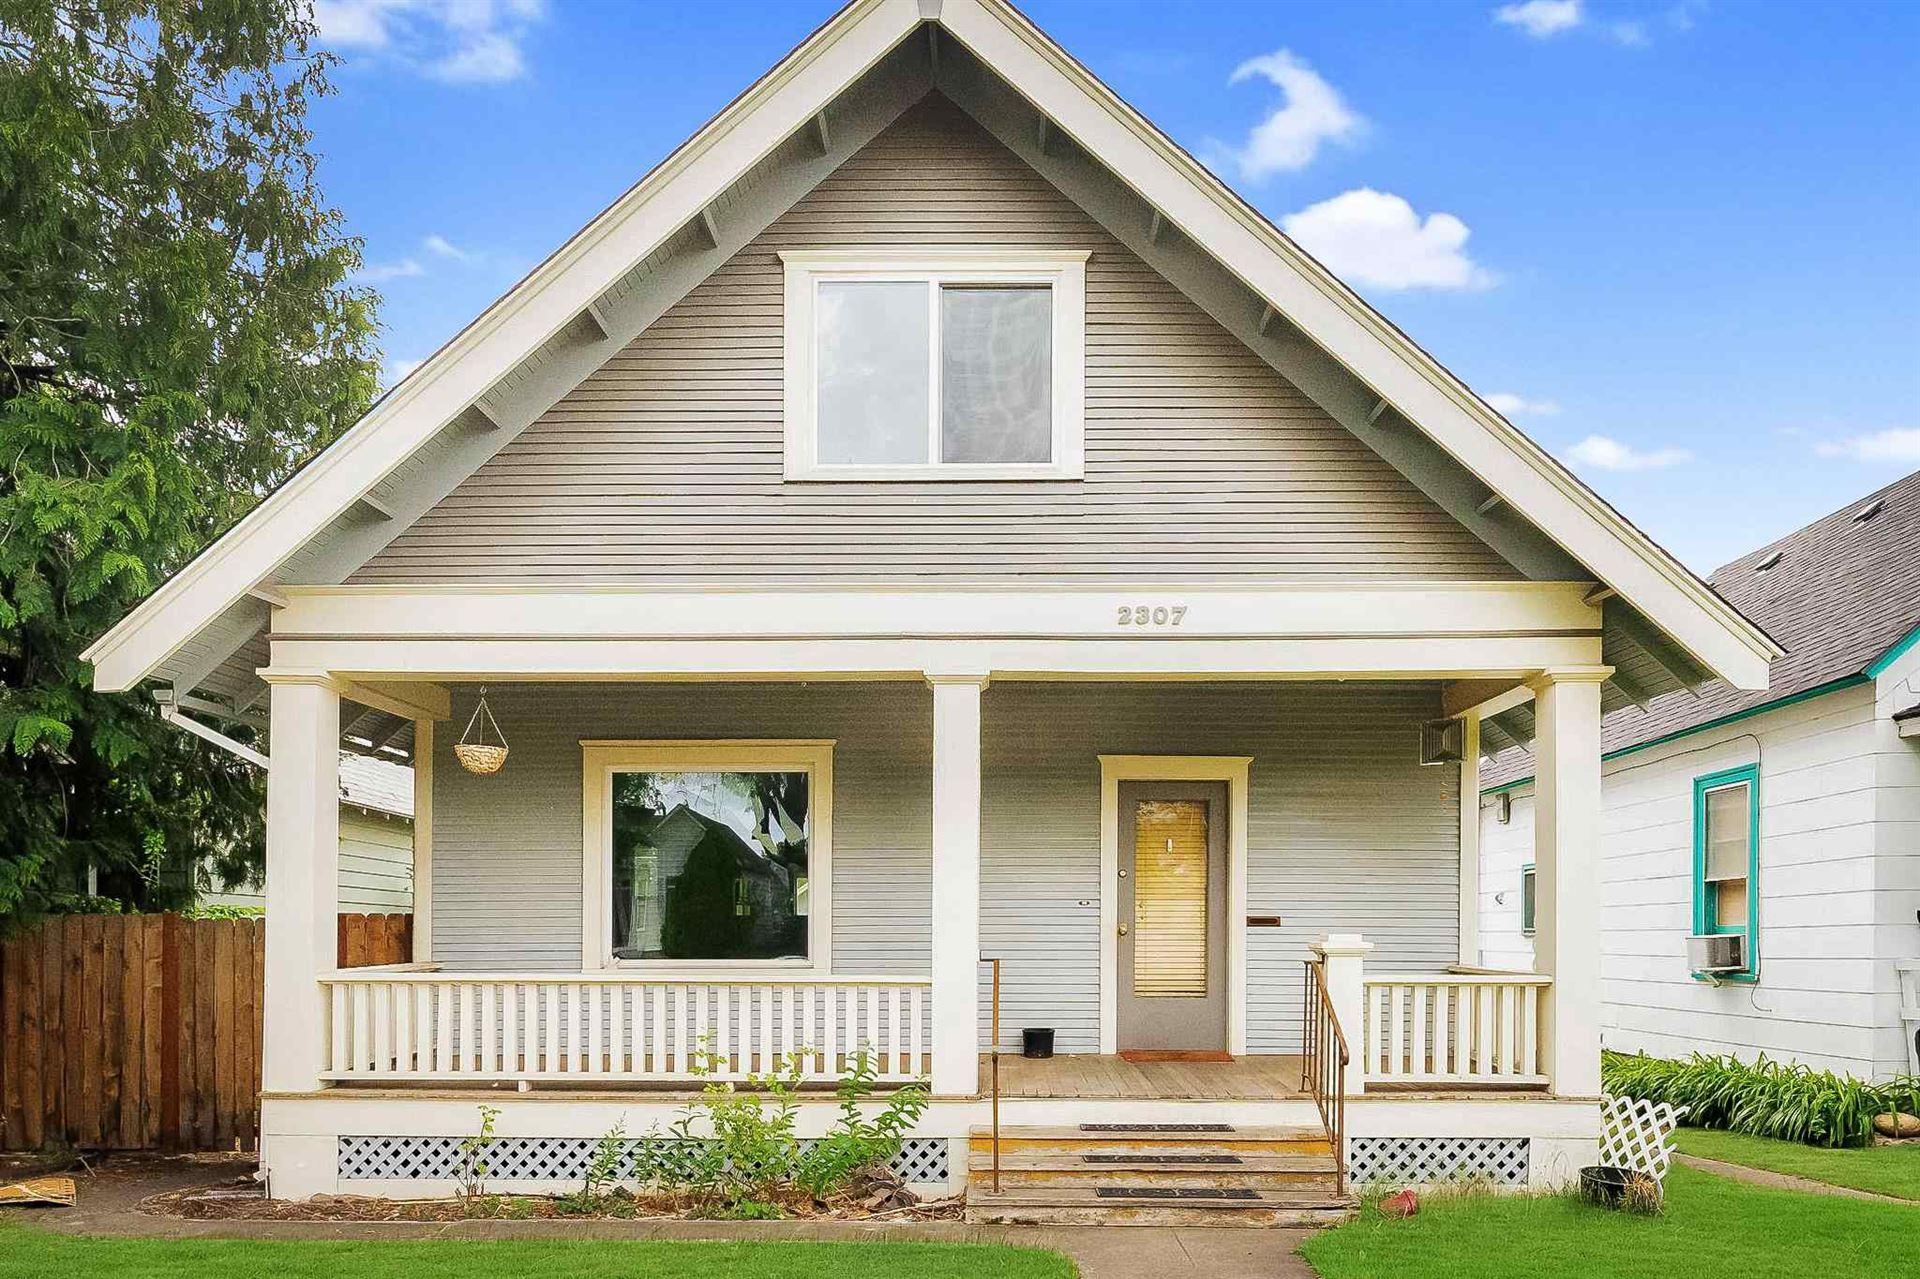 2307 W College Ave, Spokane, WA 99201 - #: 202118029